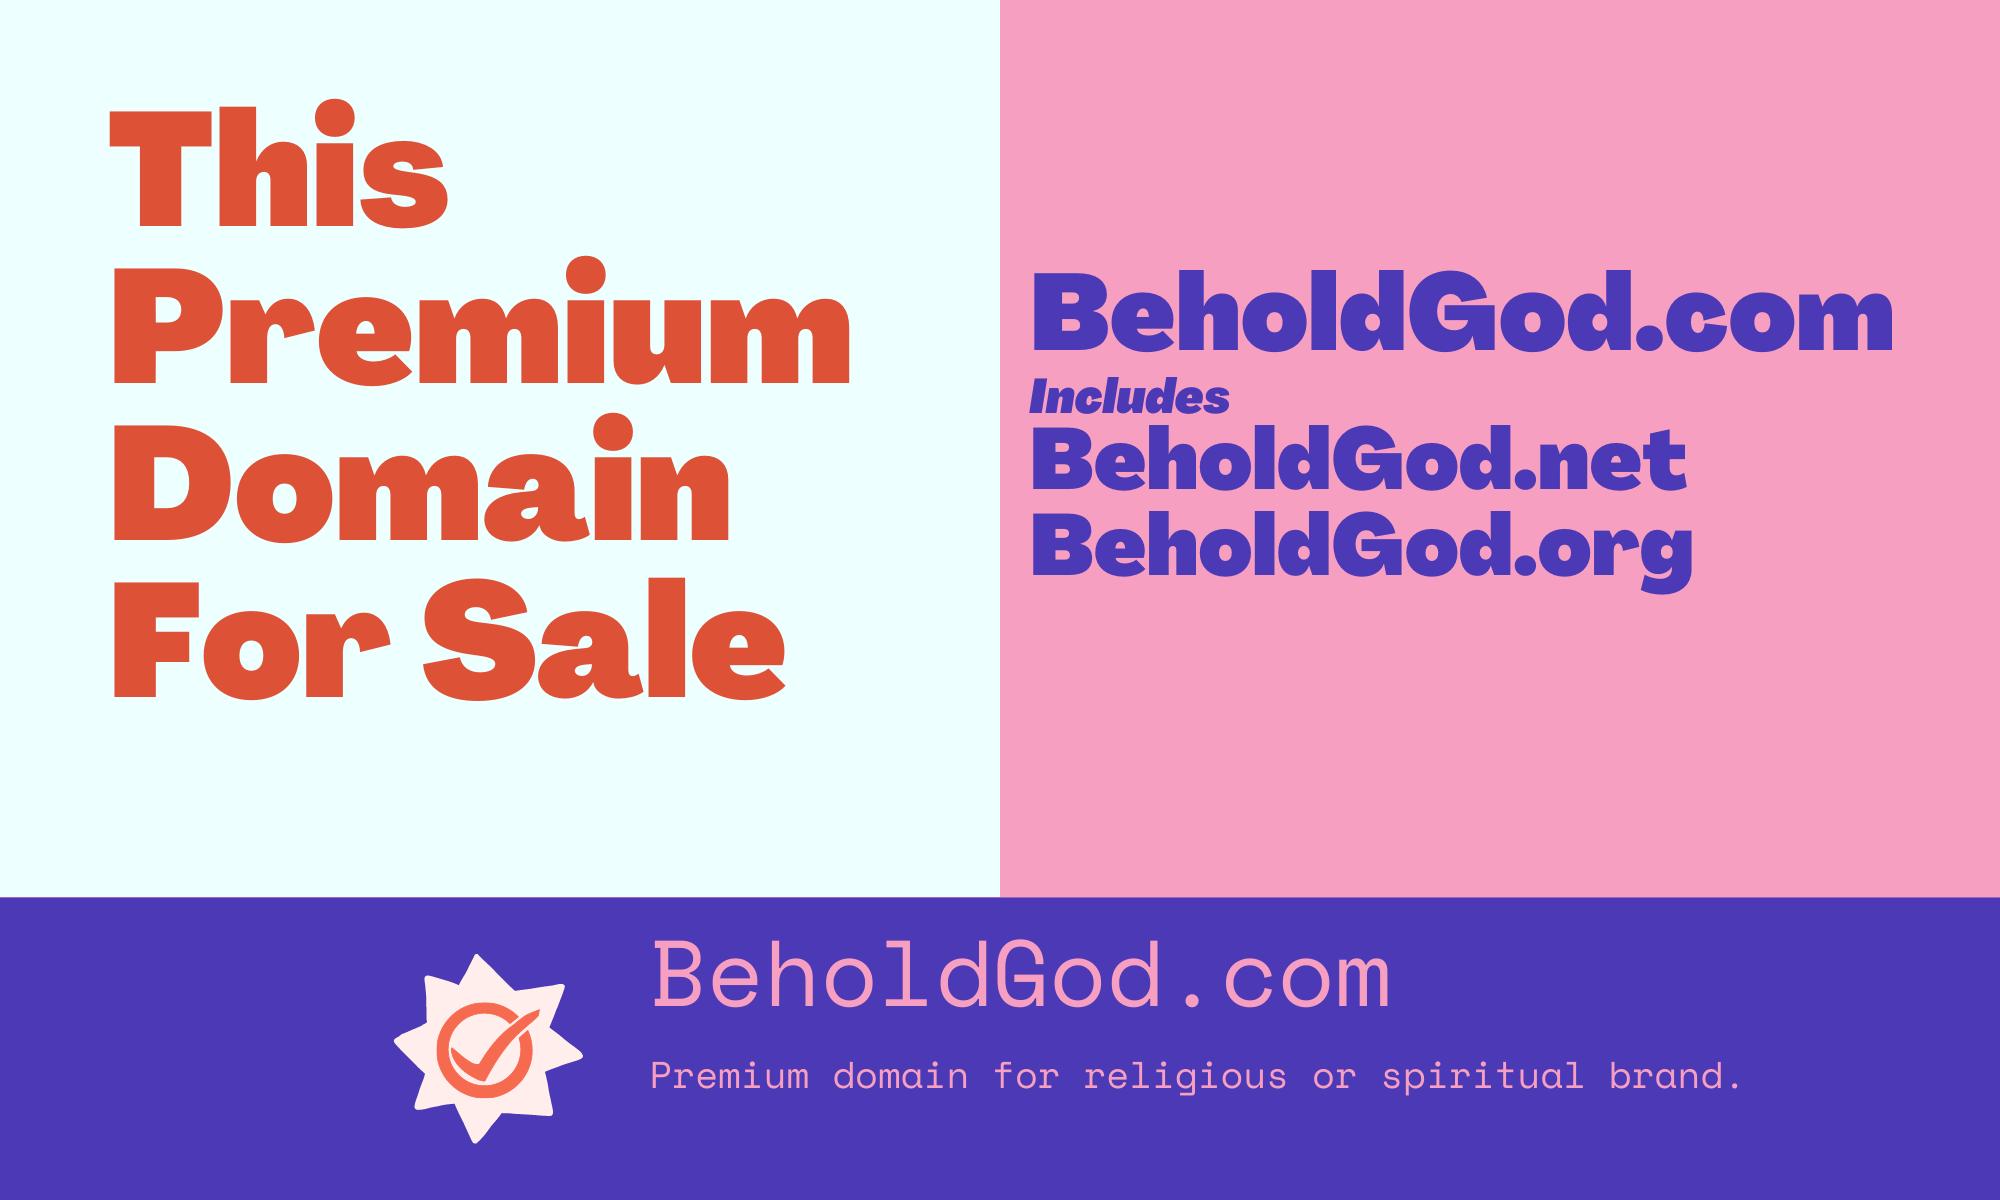 Behold God